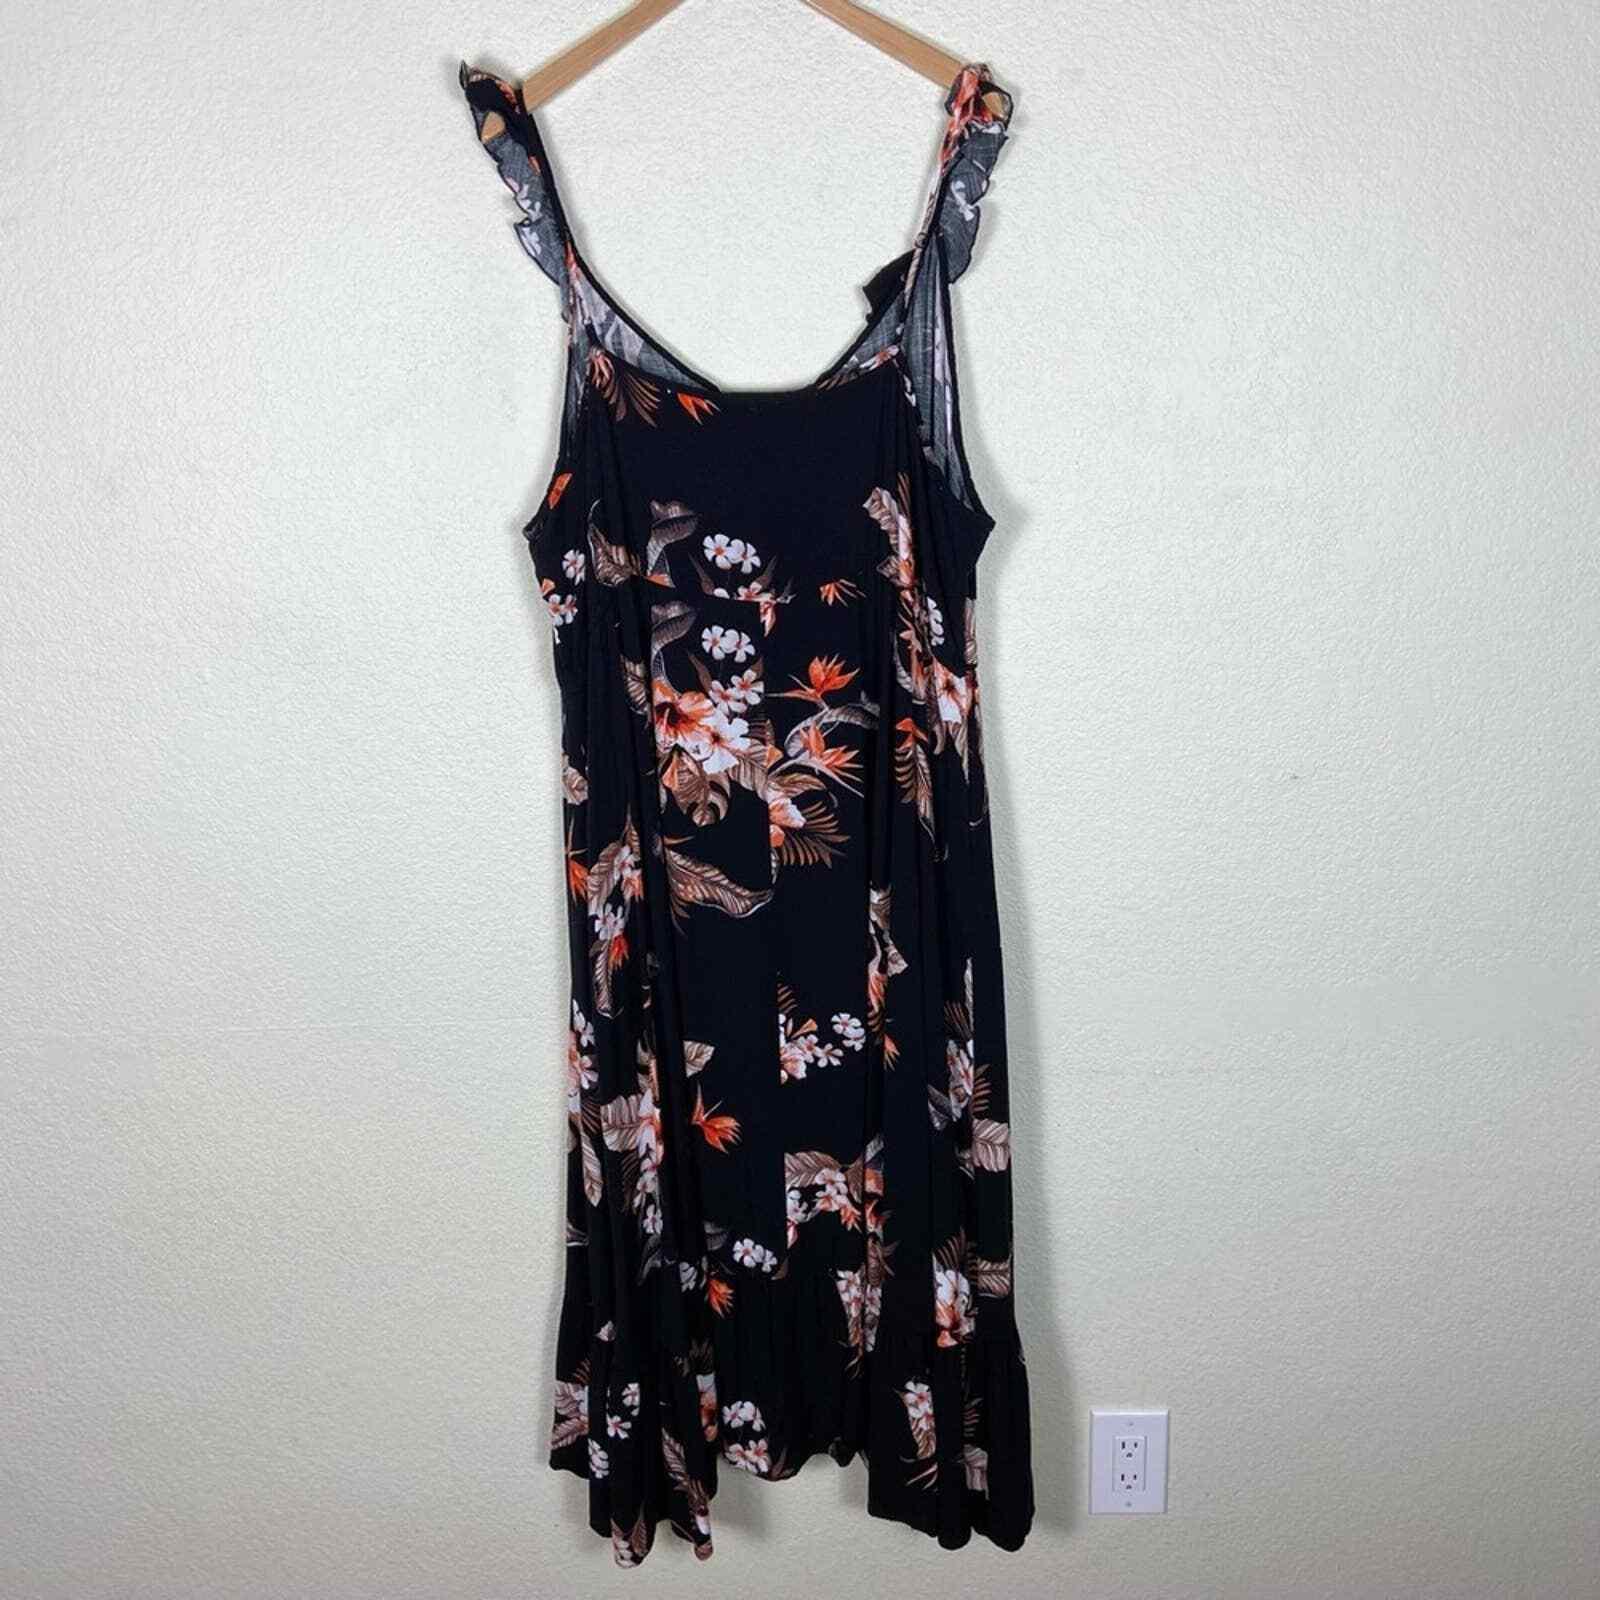 City Chic Seville Black Floral Swing Midi Dress - image 7